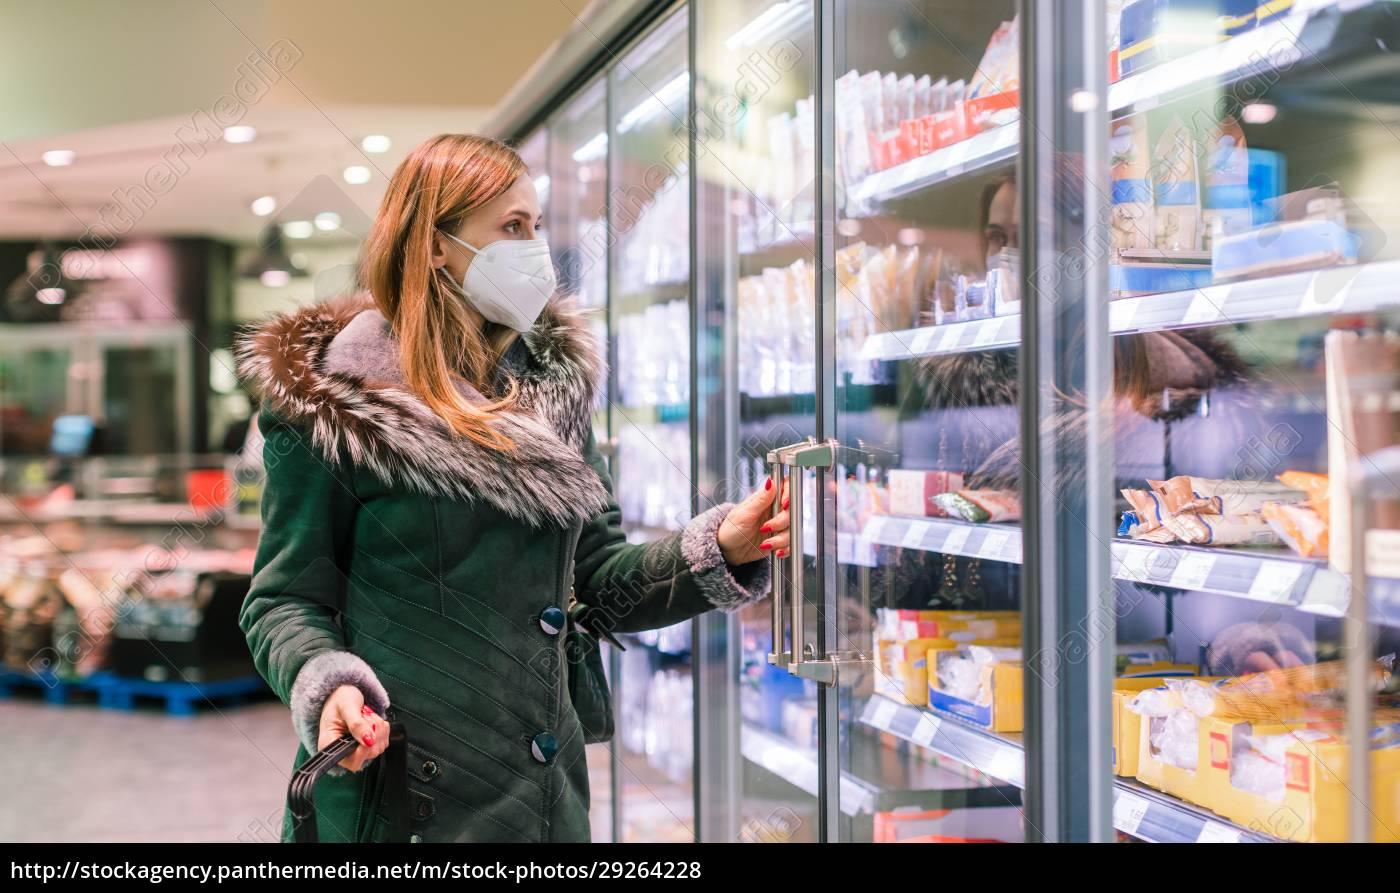 woman, at, supermarket, freezer, section, wearing - 29264228